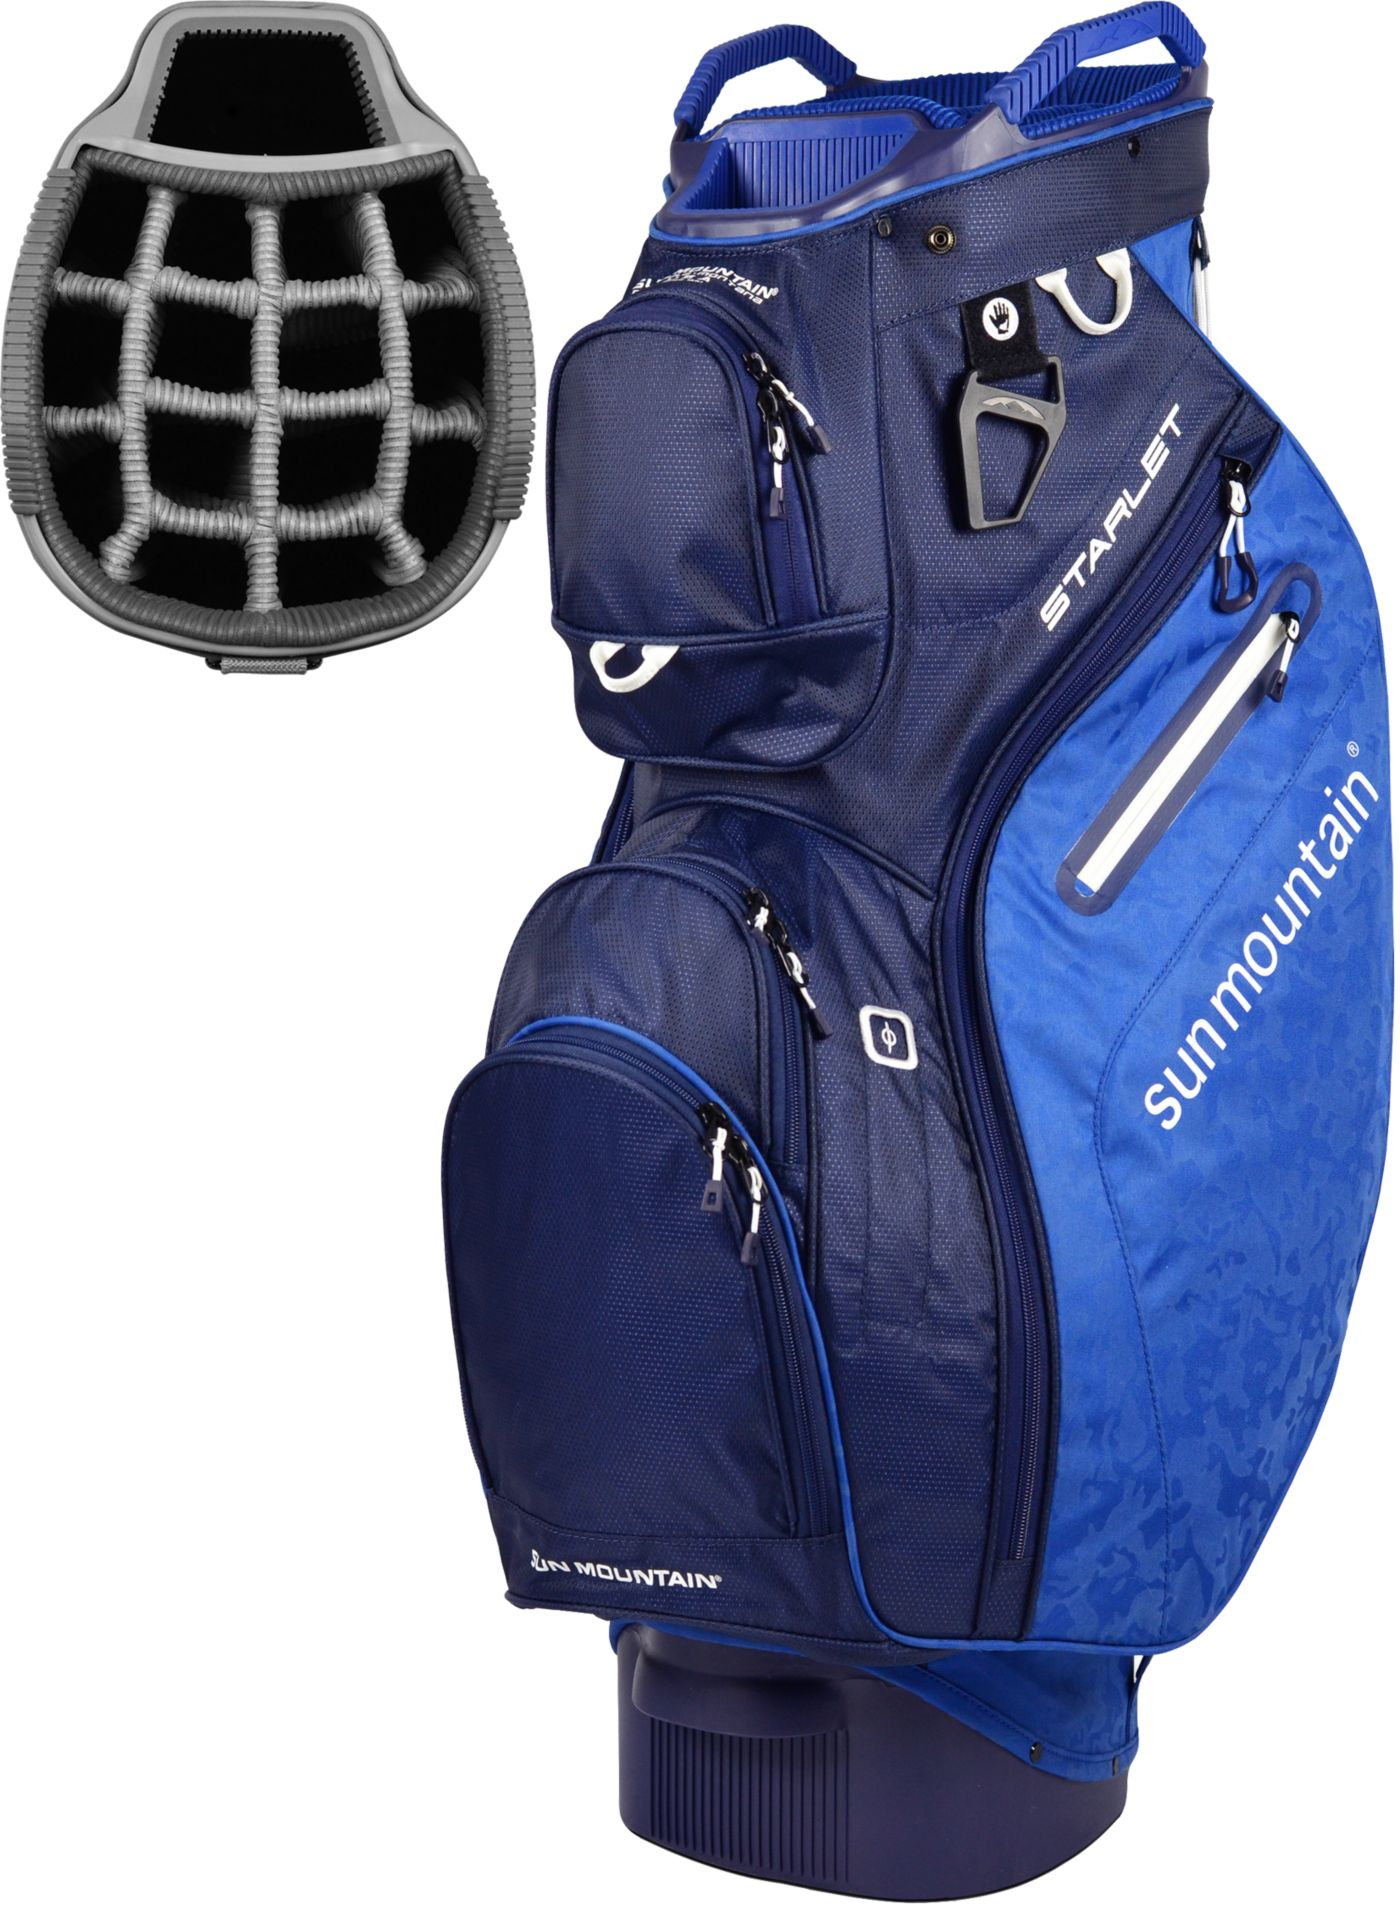 Sun Mountain Women's 2019 Starlet Cart Bag